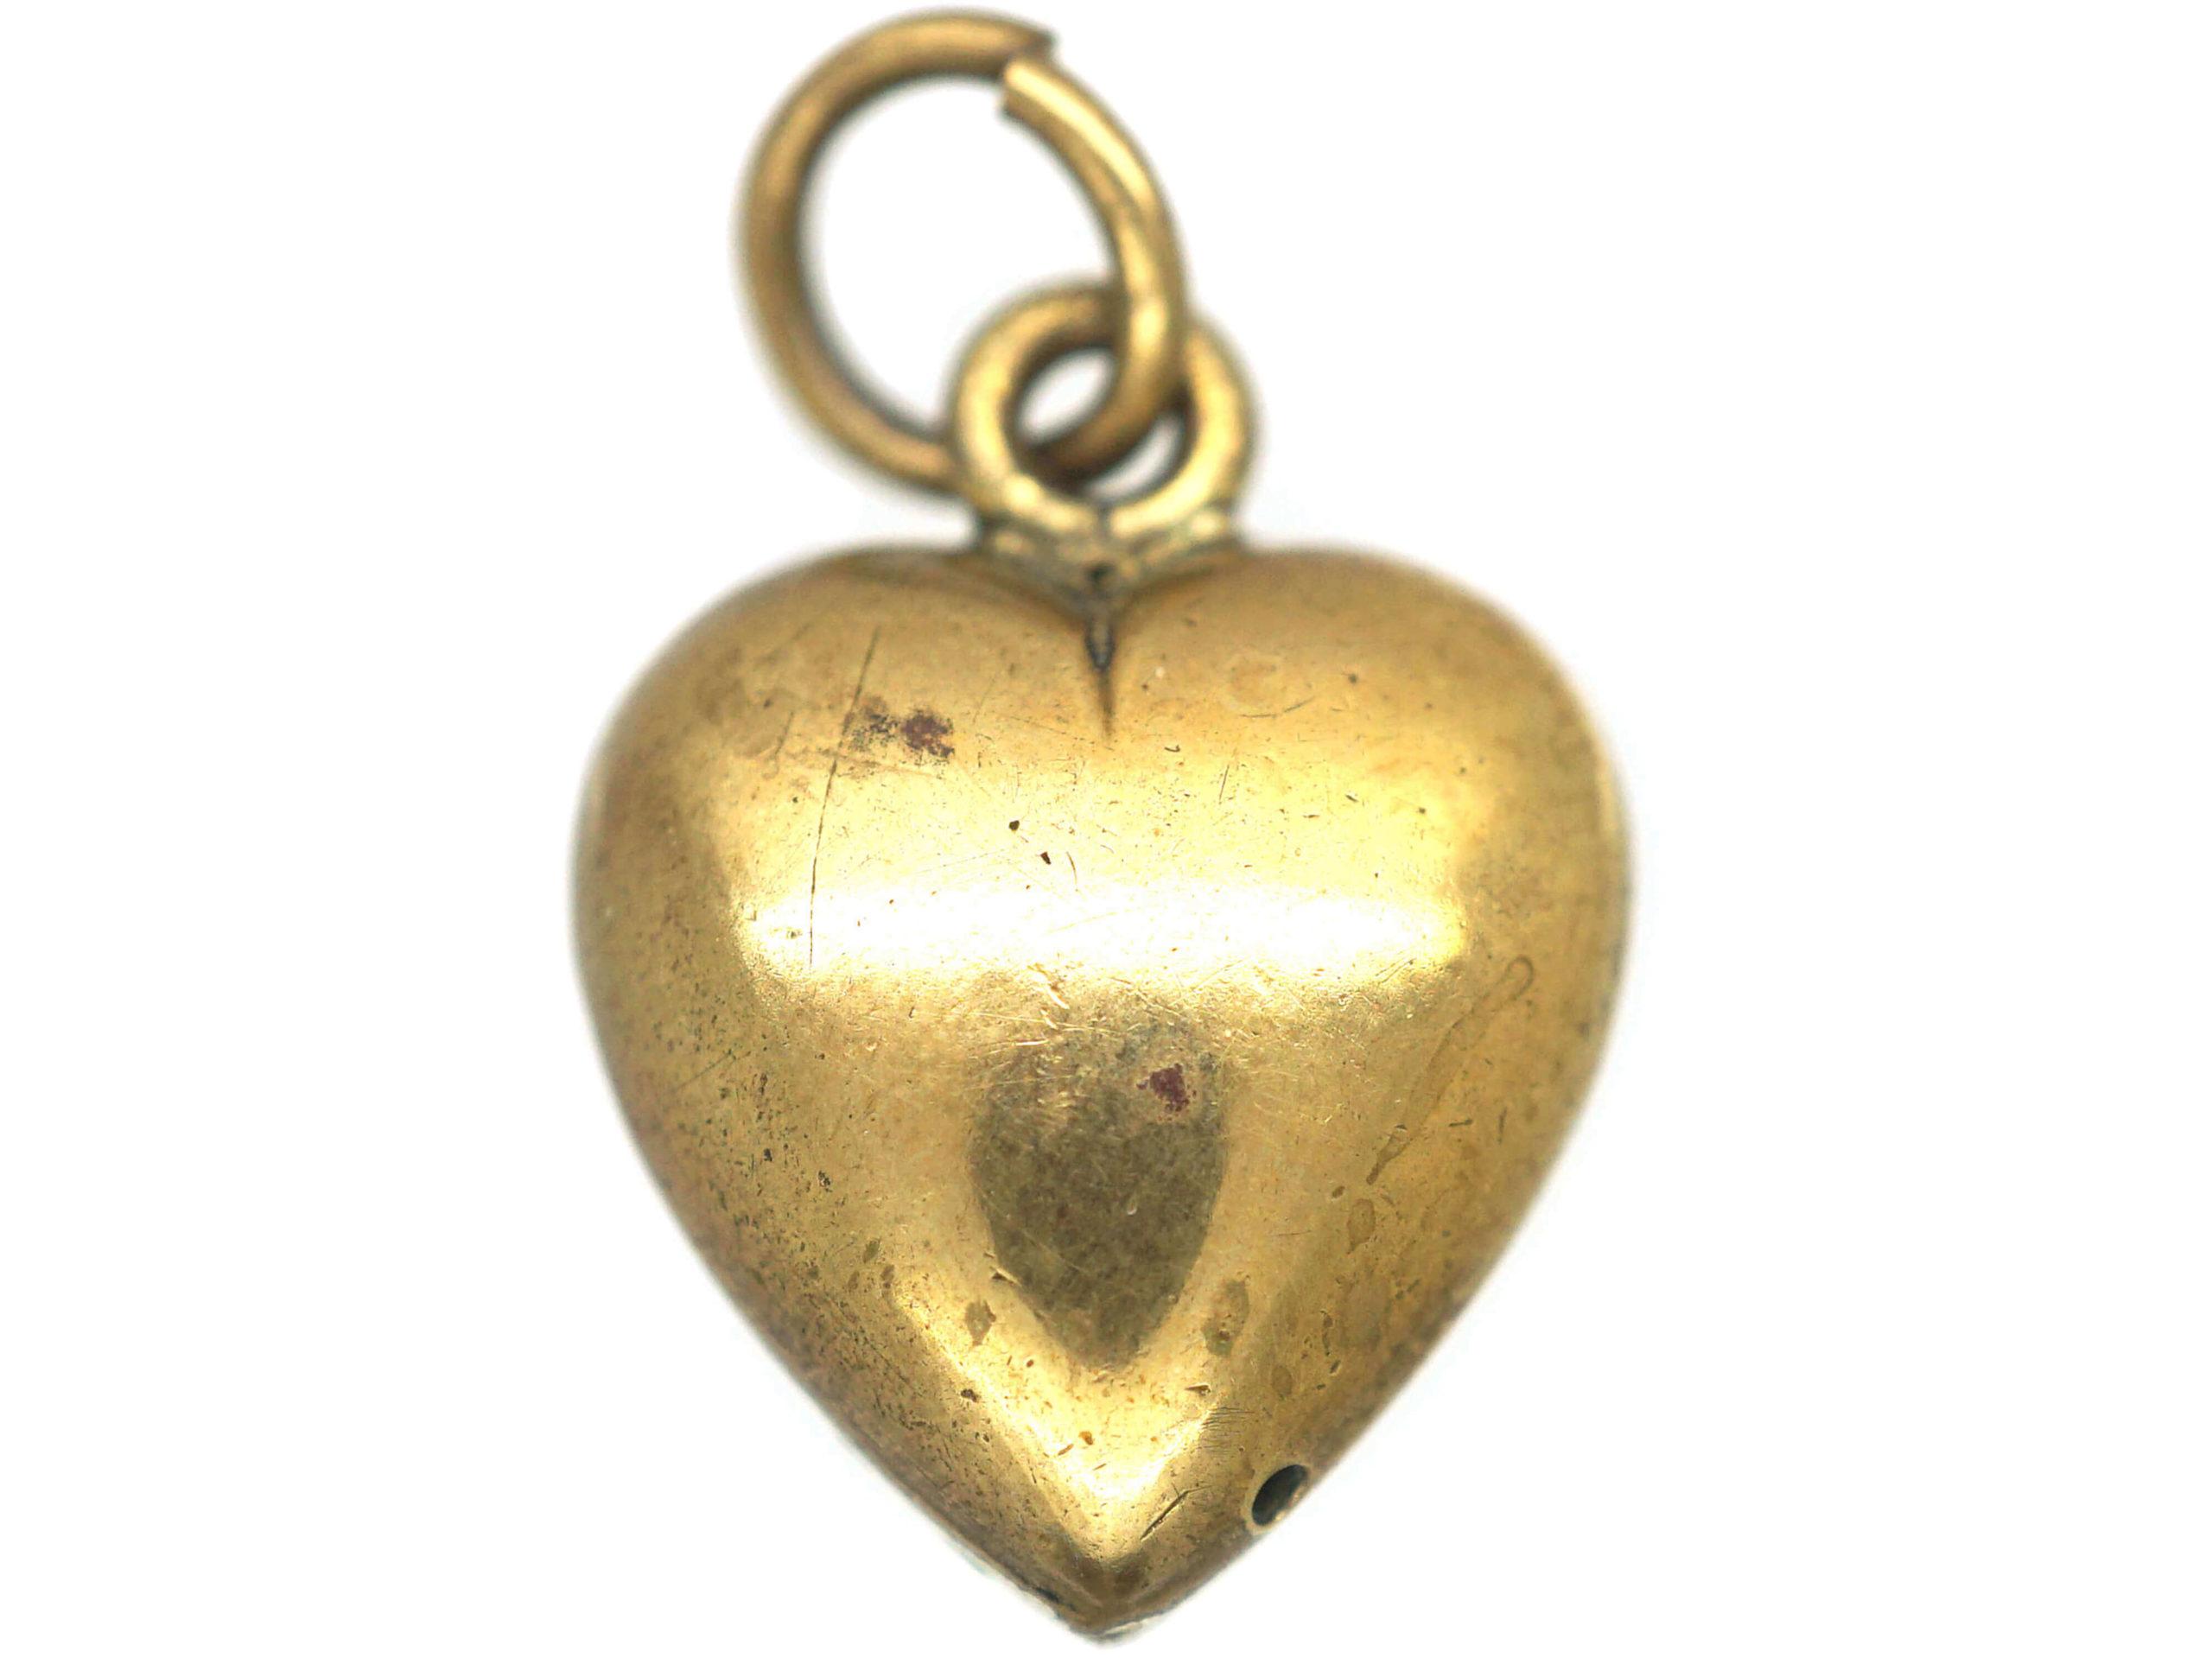 Edwardian Silver Gilt & Green Enamel Heart Shaped Pendant set with a Natural Split Pearl